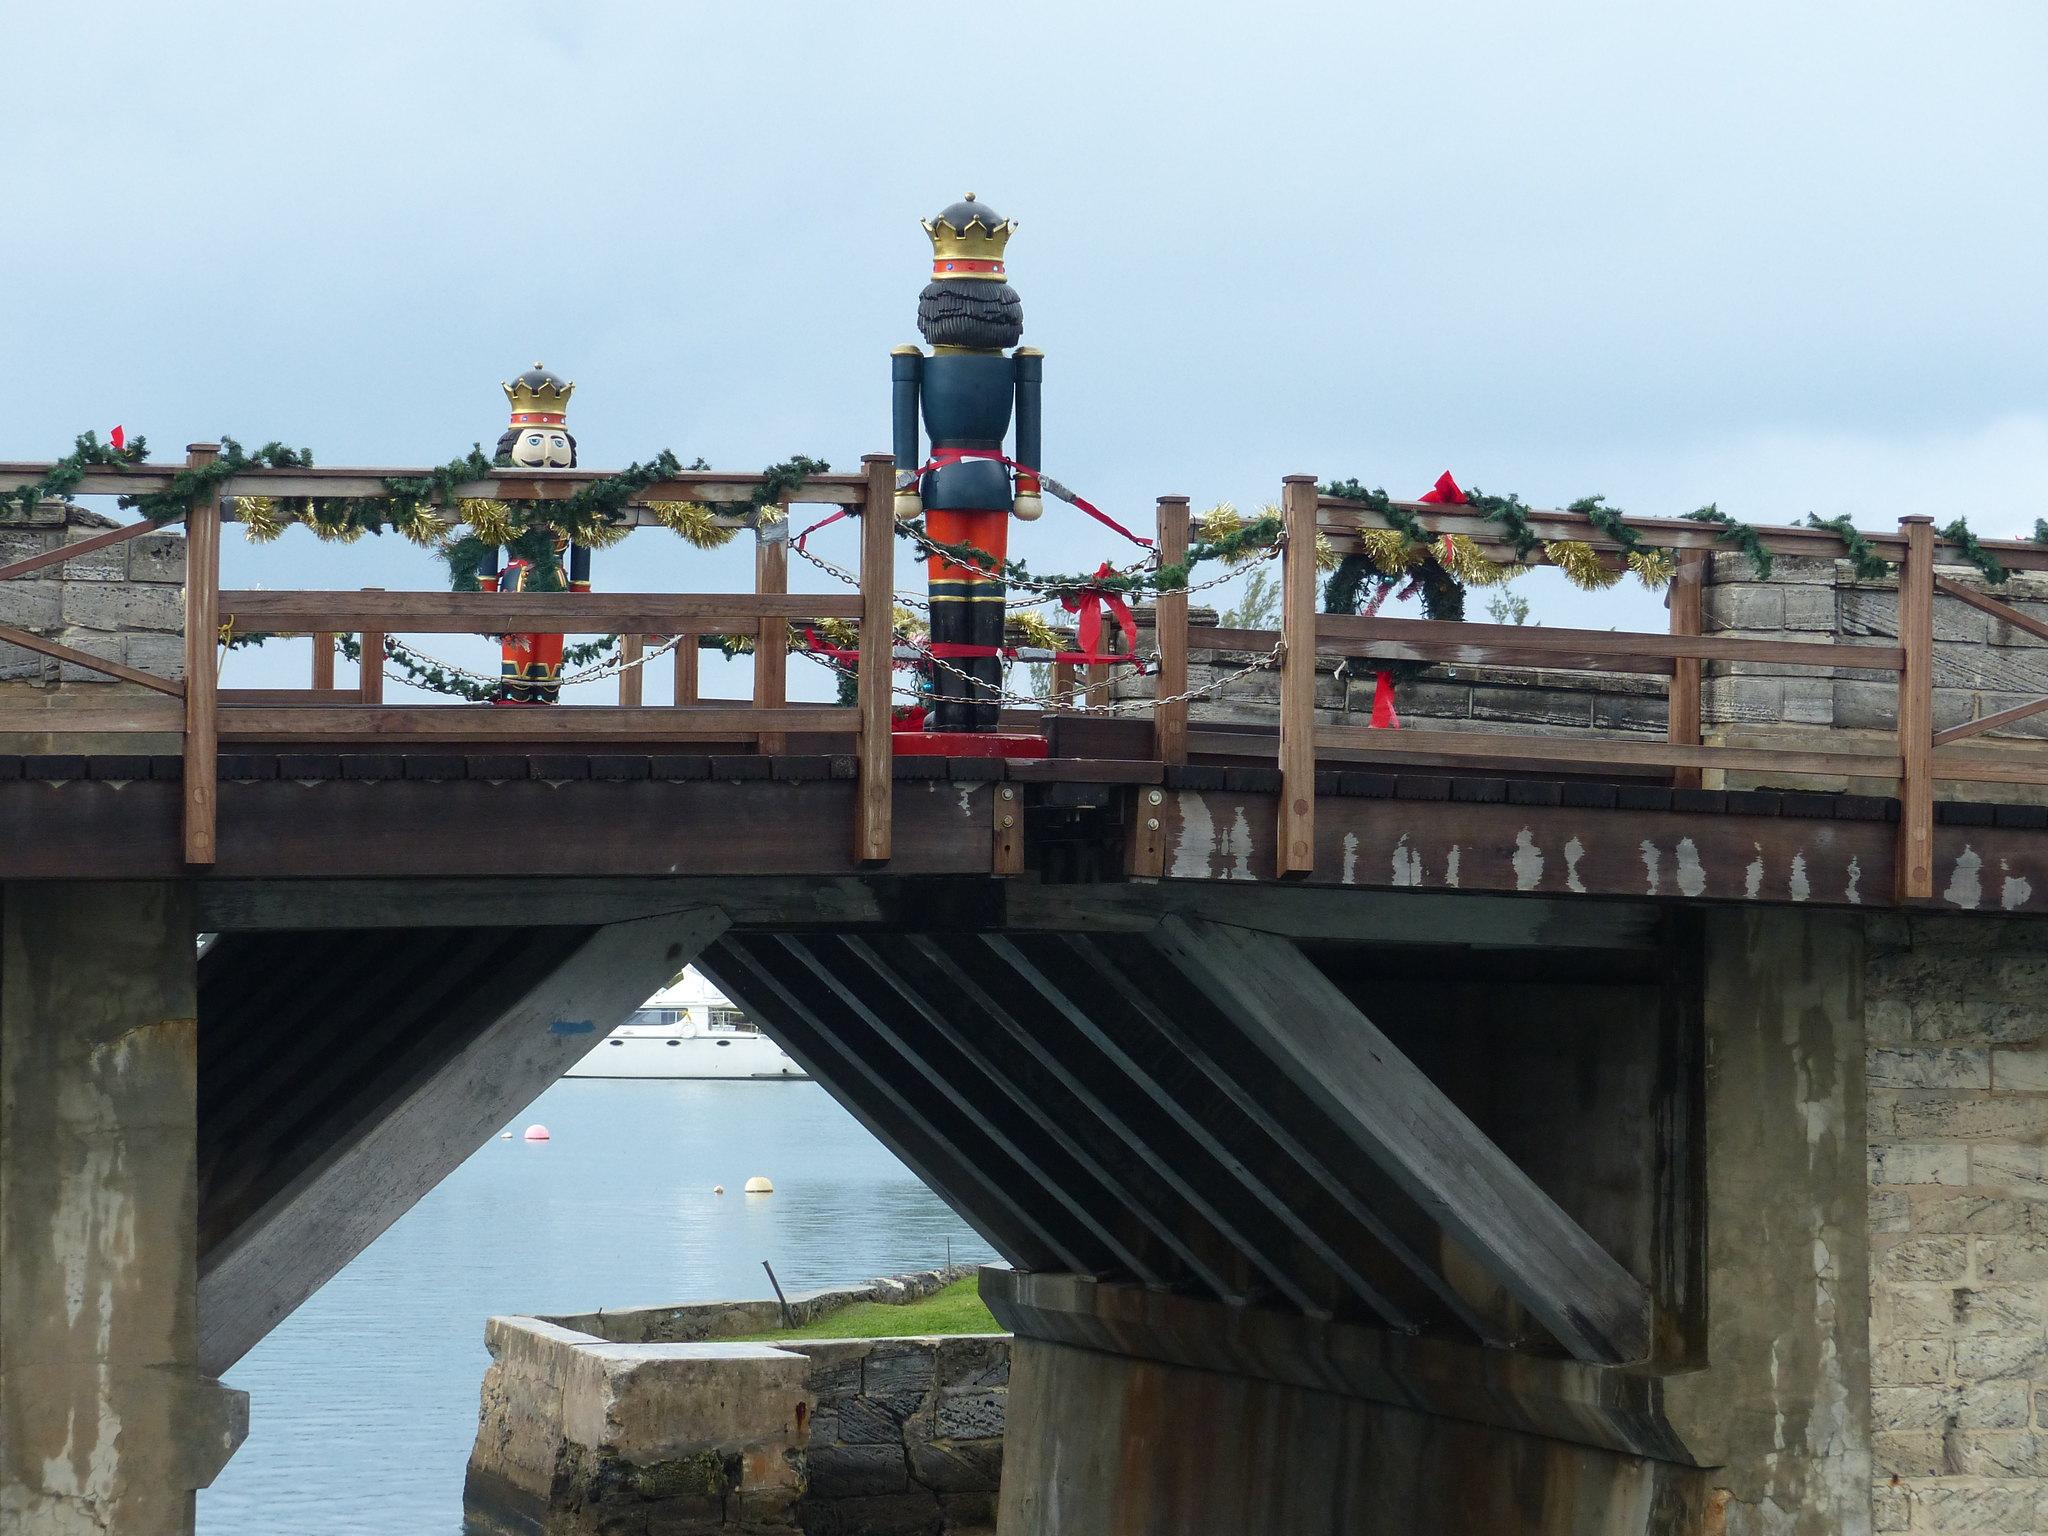 Bermuda - World's Smallest Drawbridge